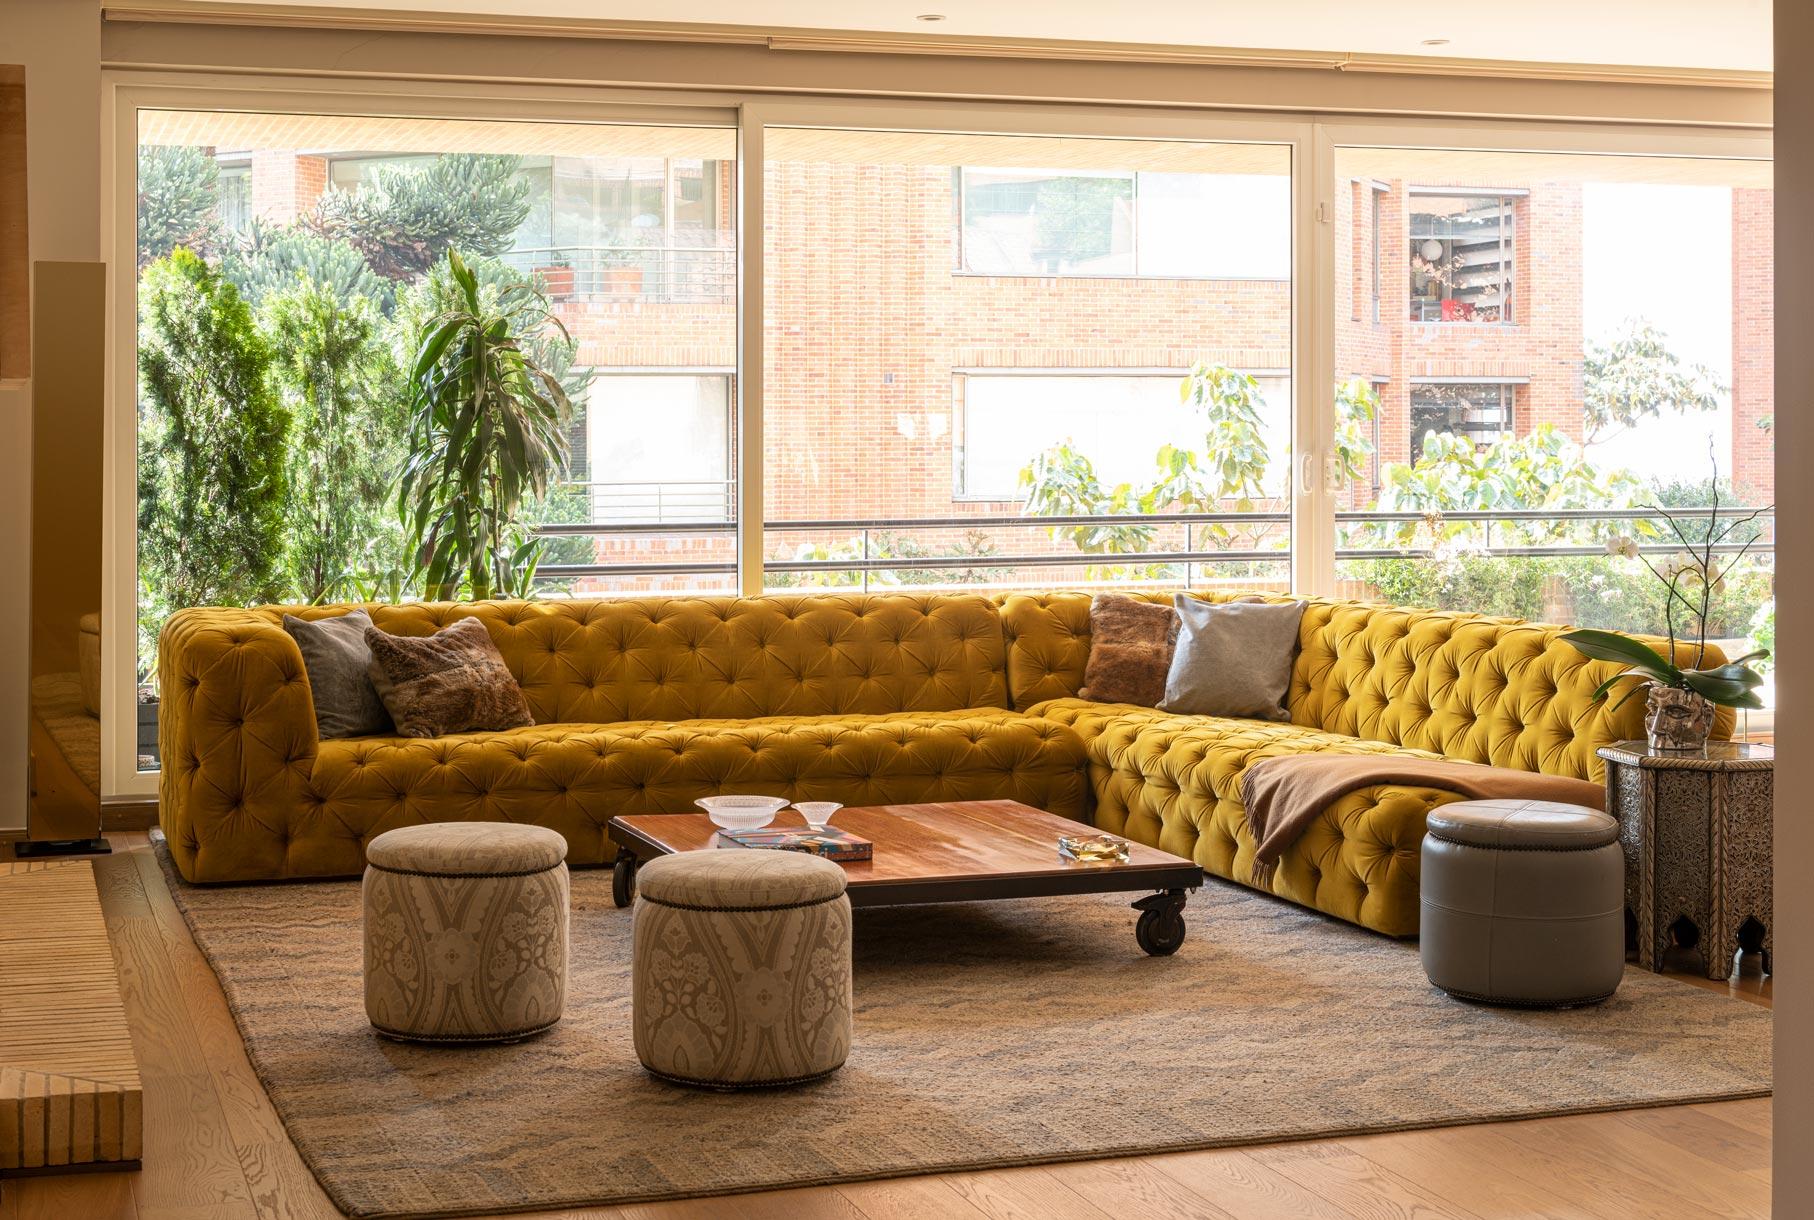 Apartment Terrace, Bogota, Veronica Mishaan